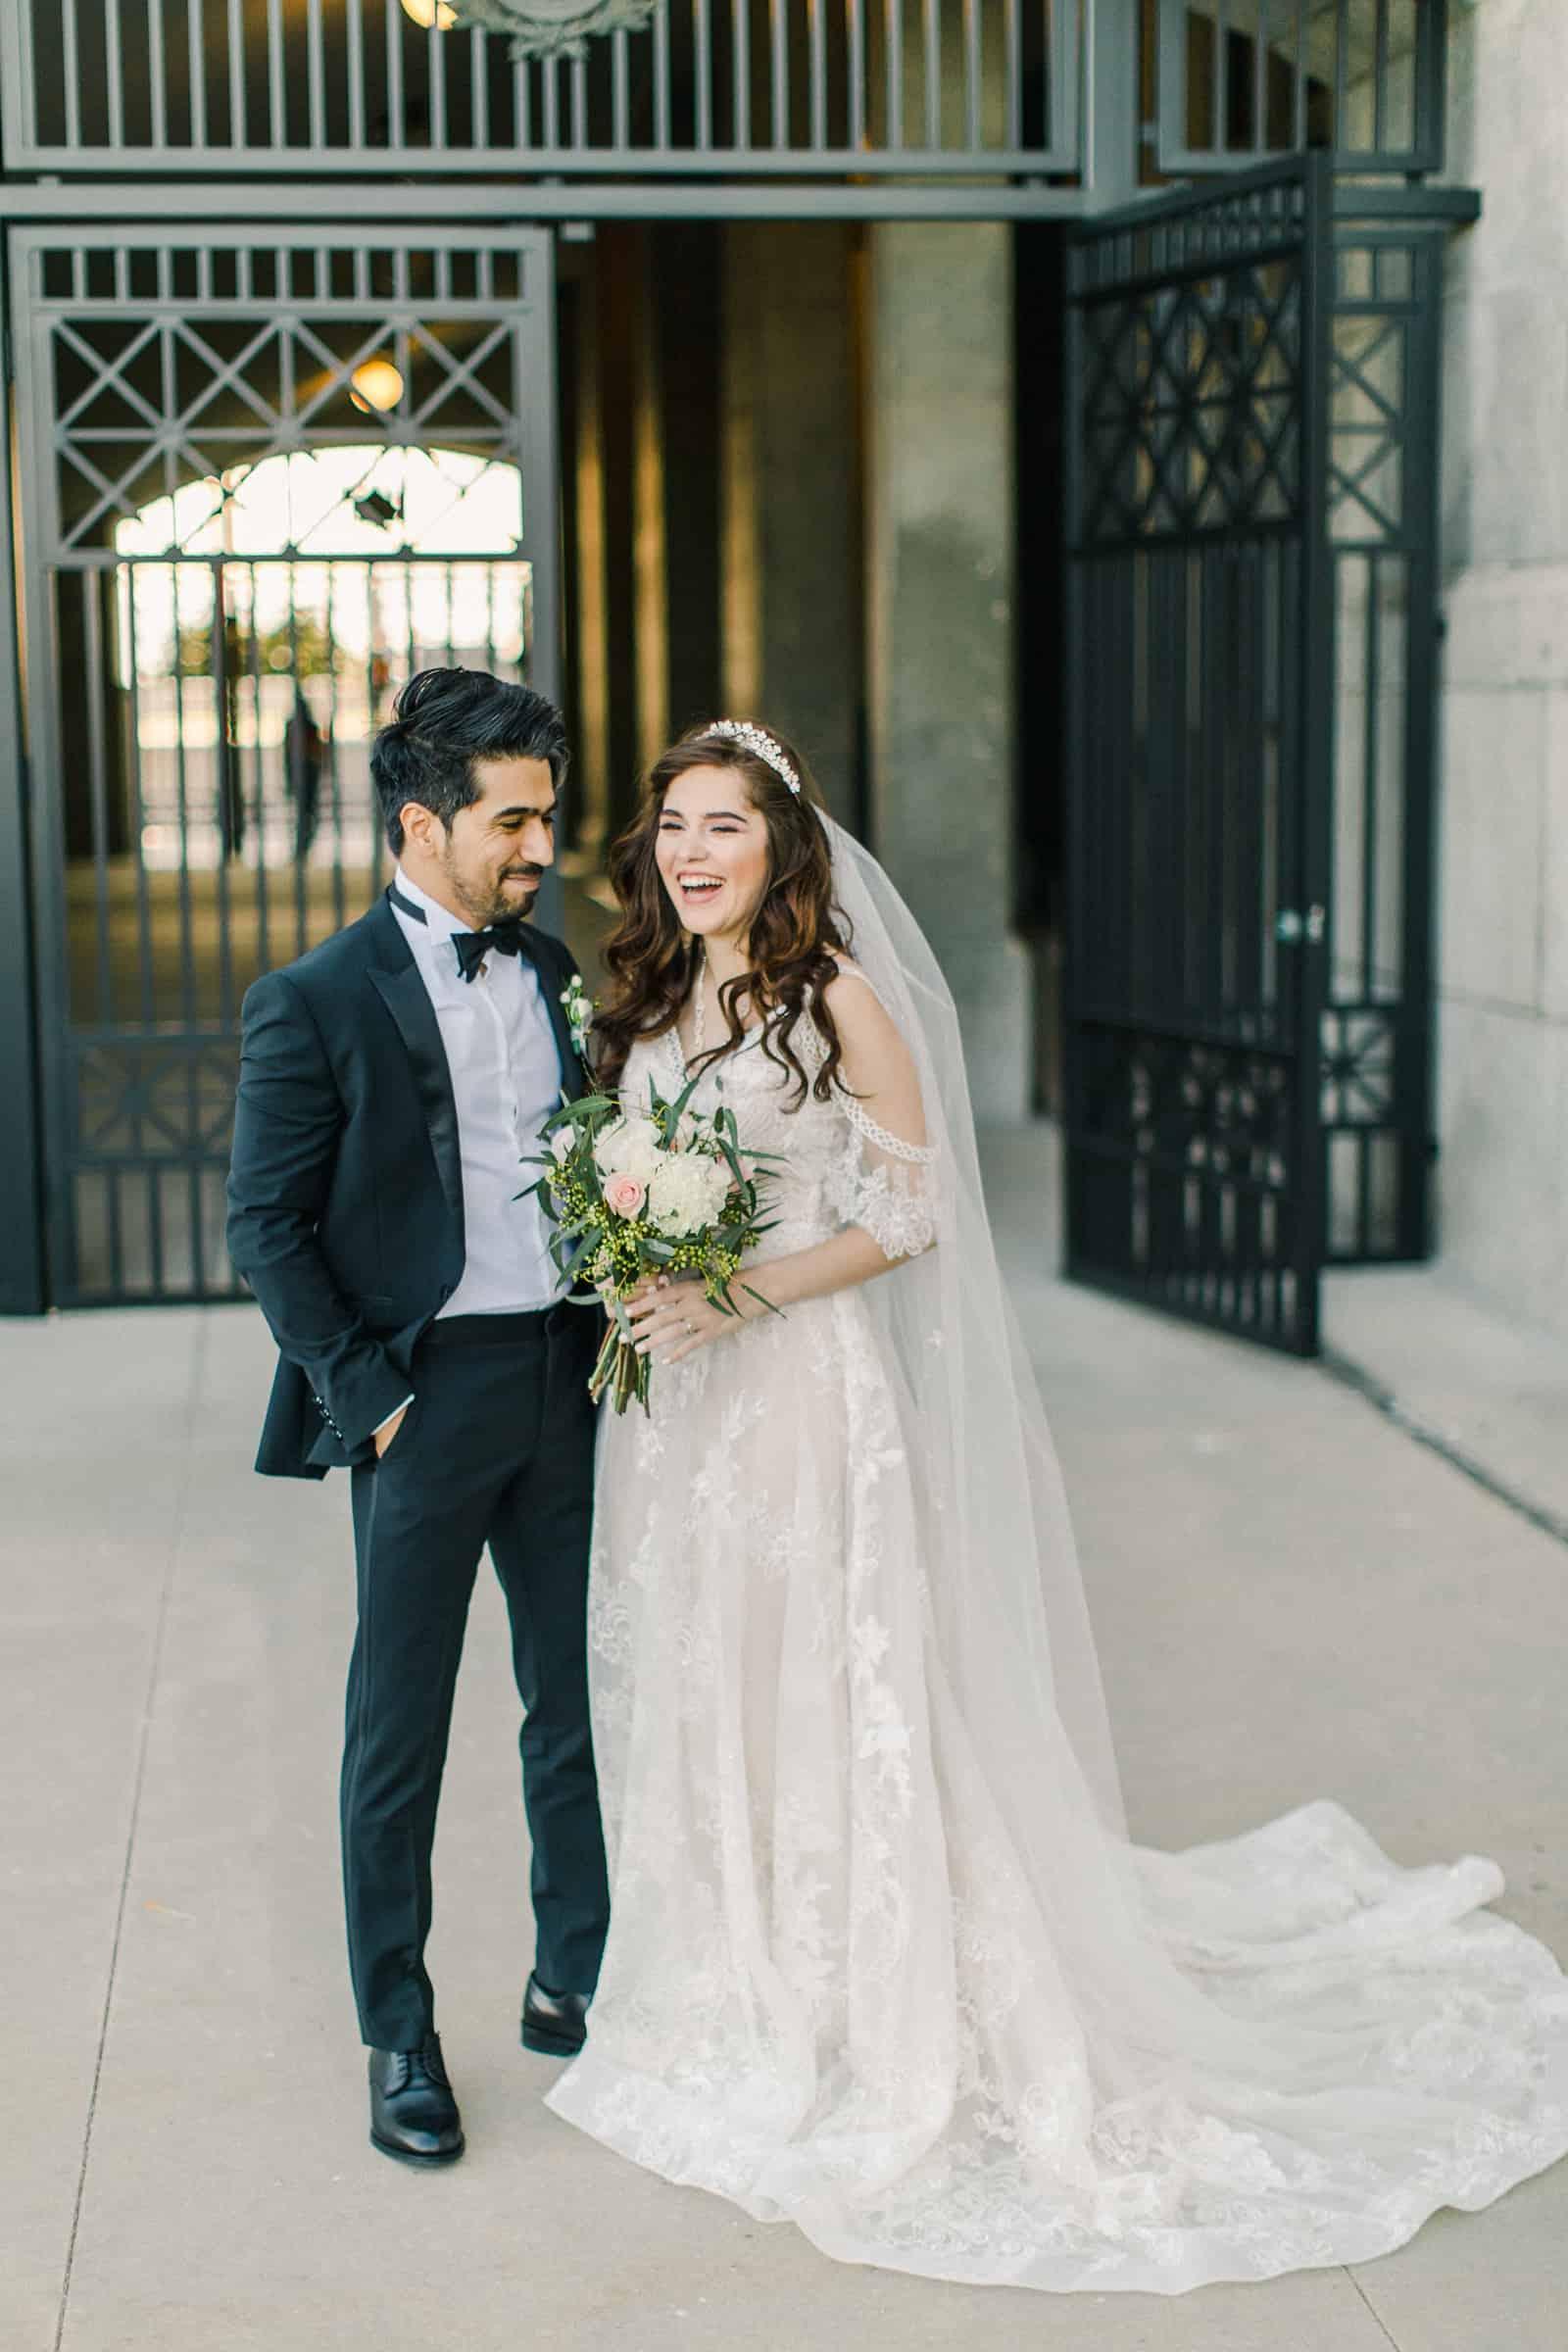 Palestinian Iranian Bride and Groom, Utah Wedding Photography at the Utah State Capitol, travel destination wedding photographer, bride laughing